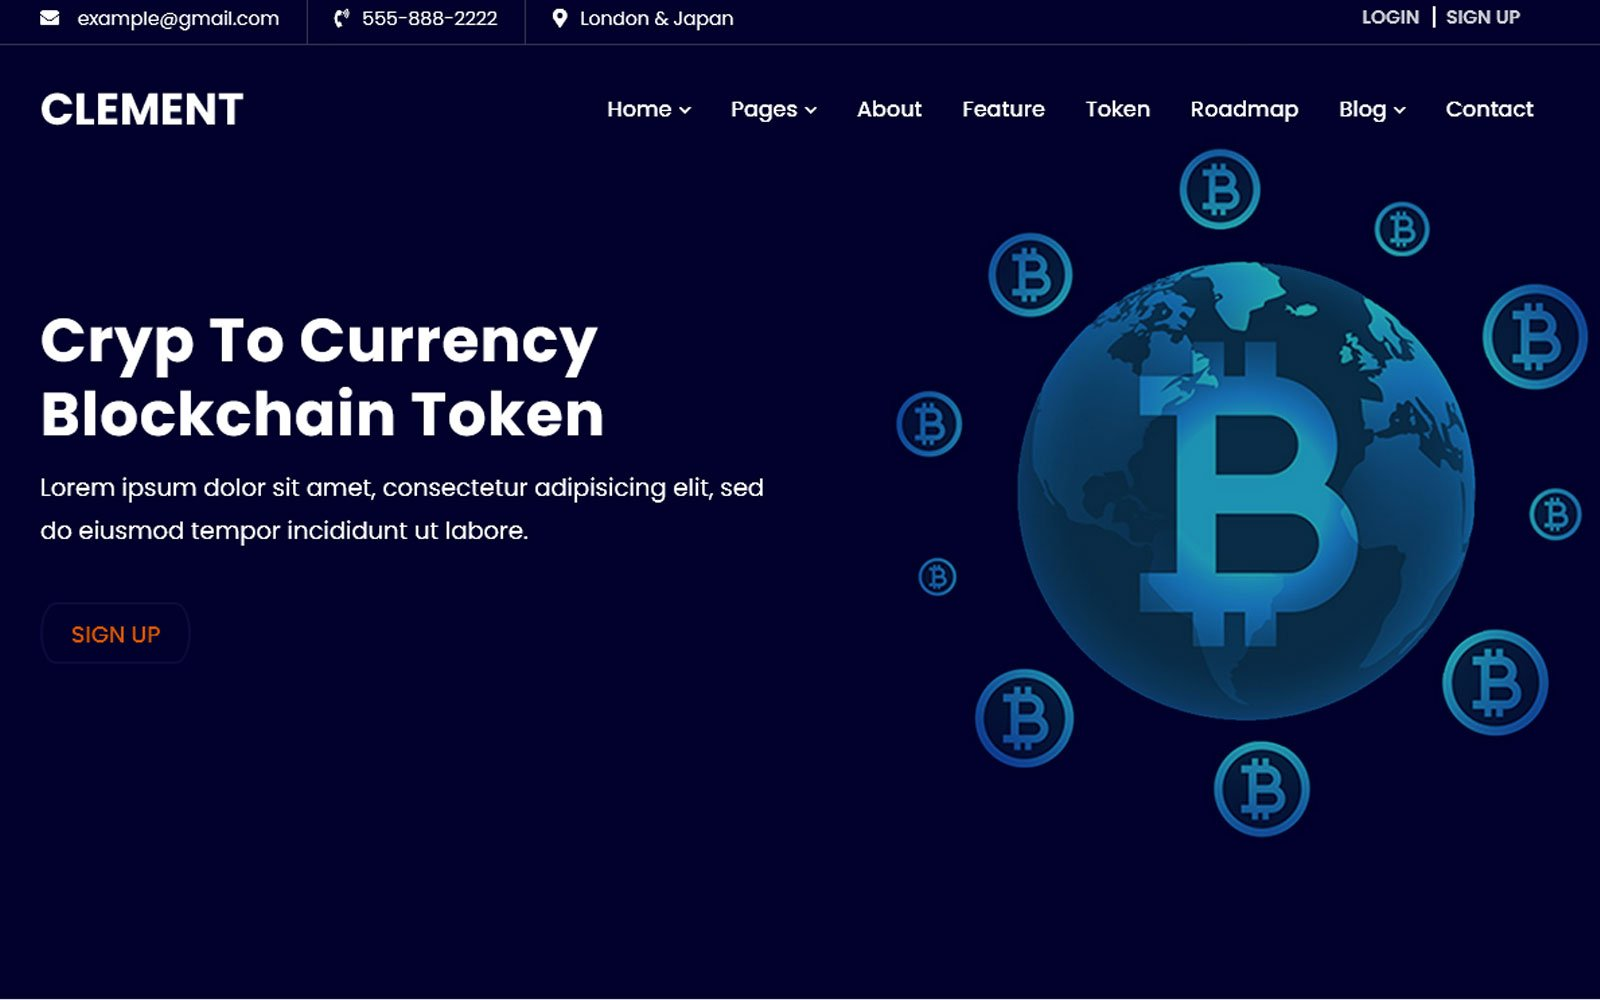 Clement -ICO 比特币和加密货币网站模板